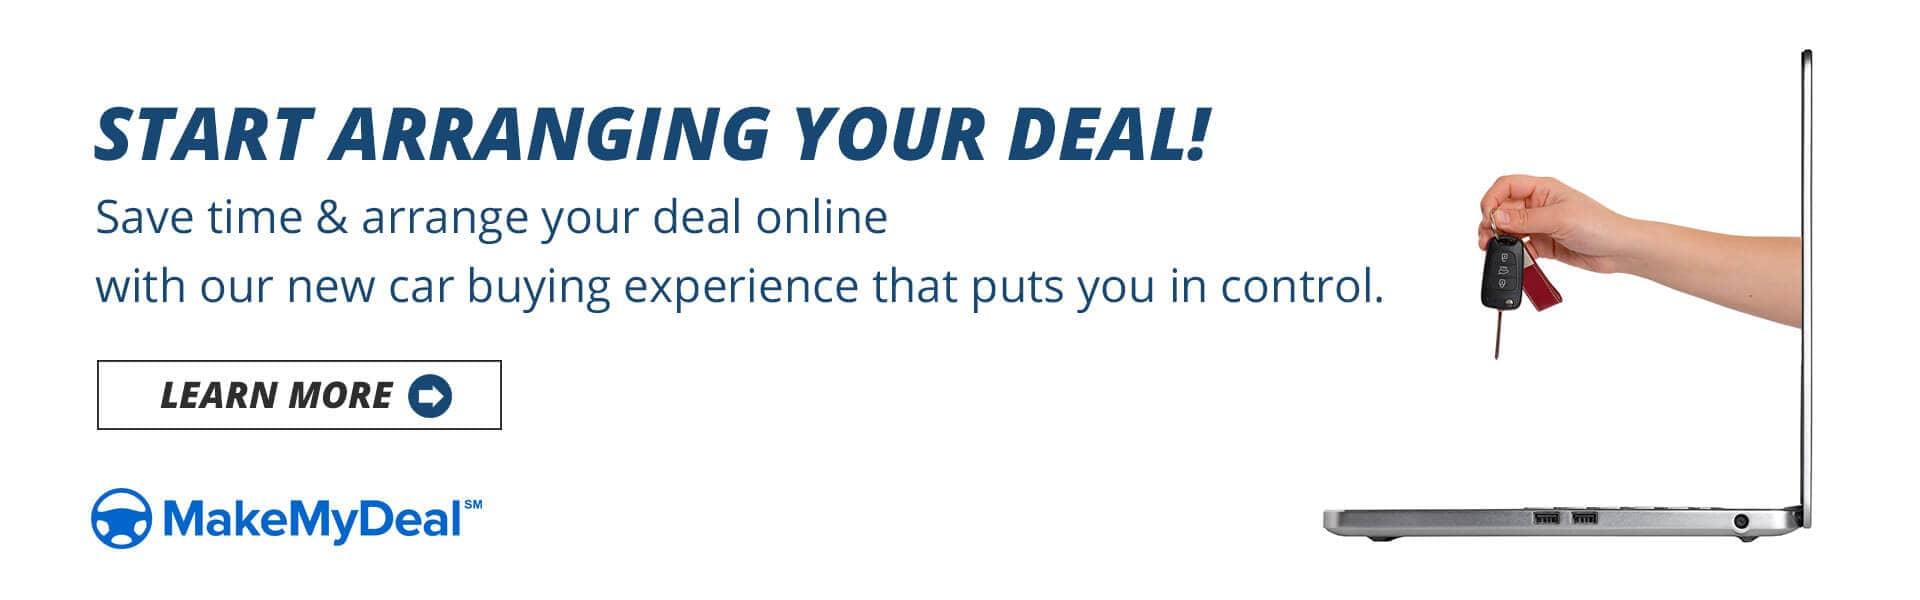 Start Arranging Your Deal